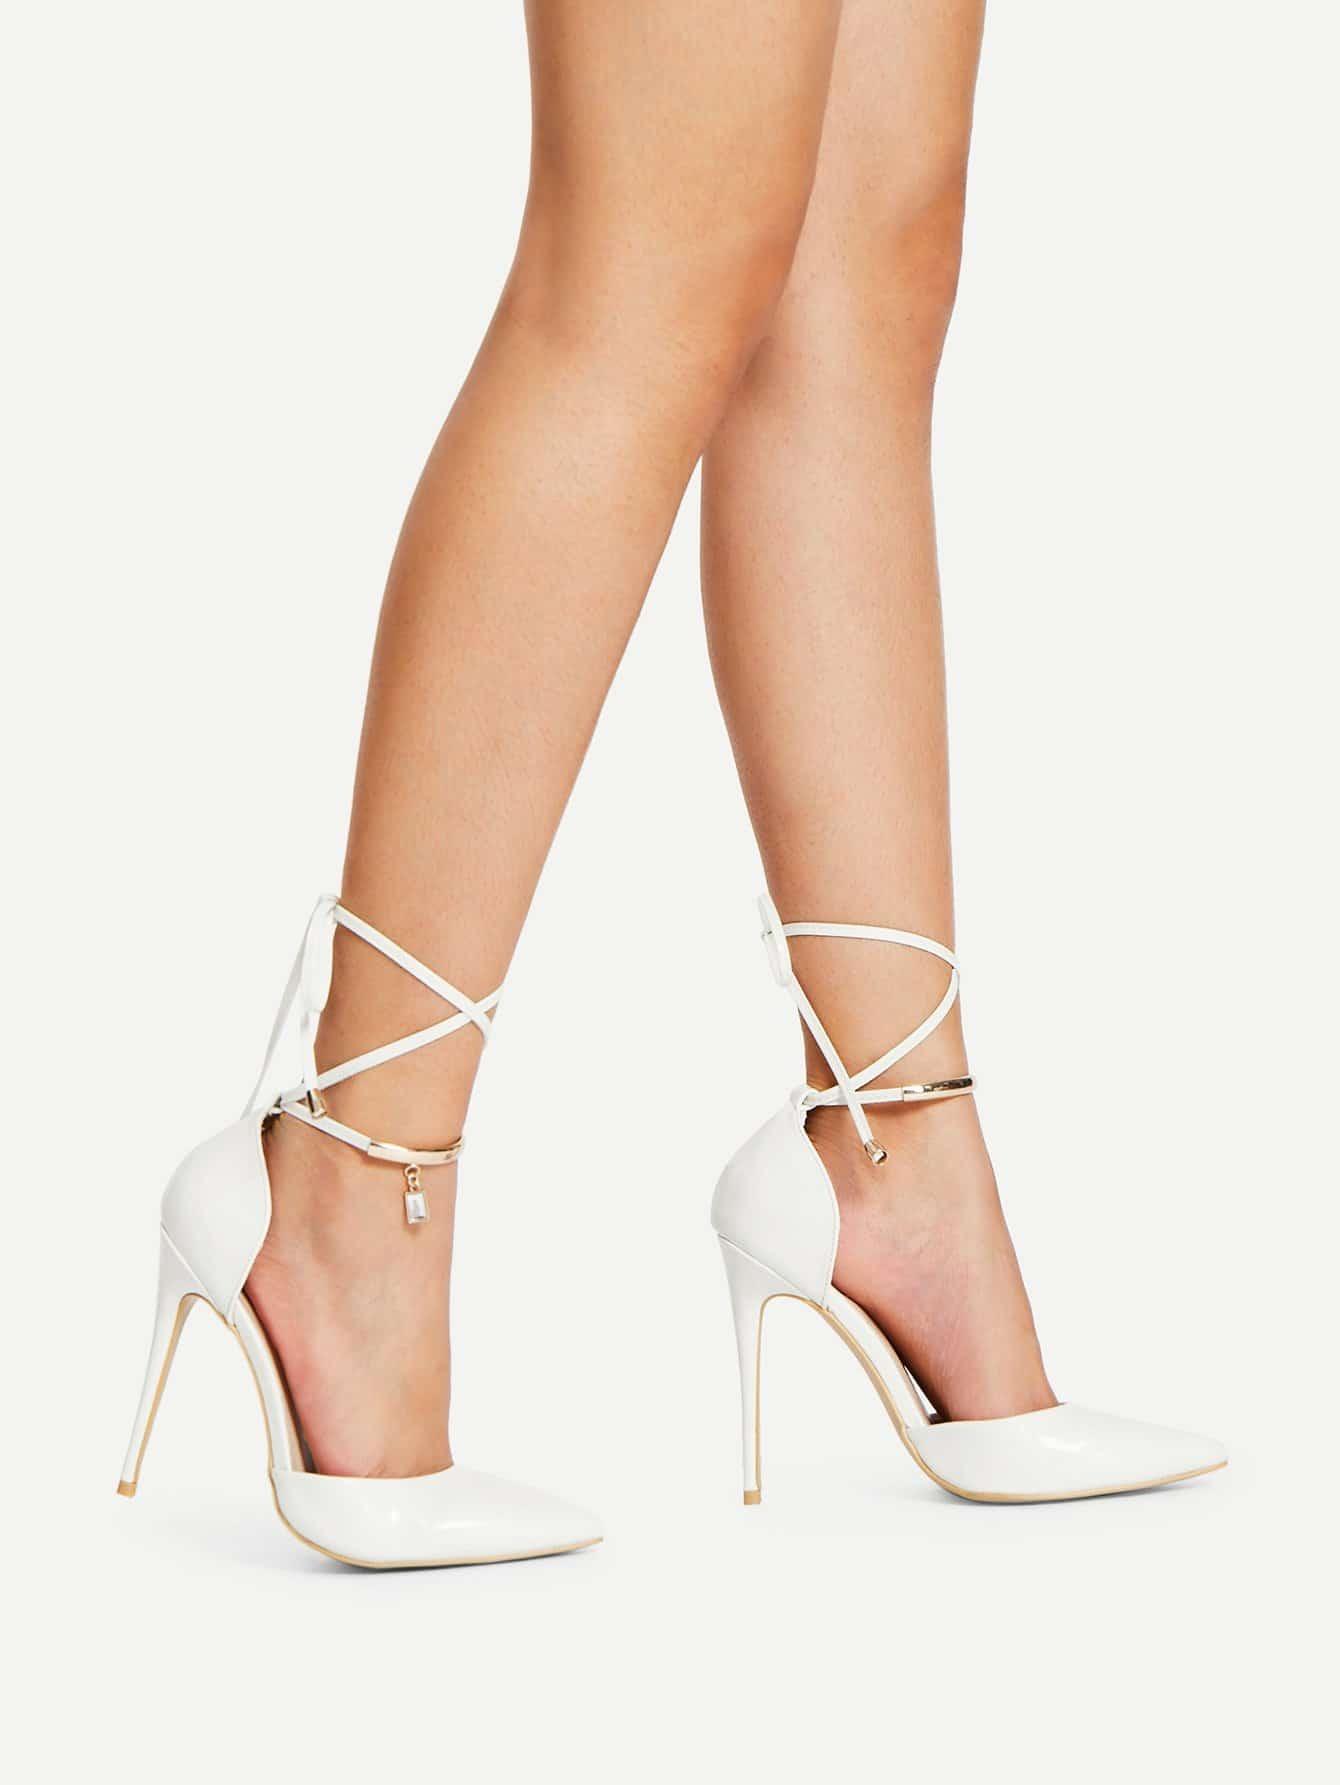 Pointed Toe Tie Leg Stiletto Heels цена 2017